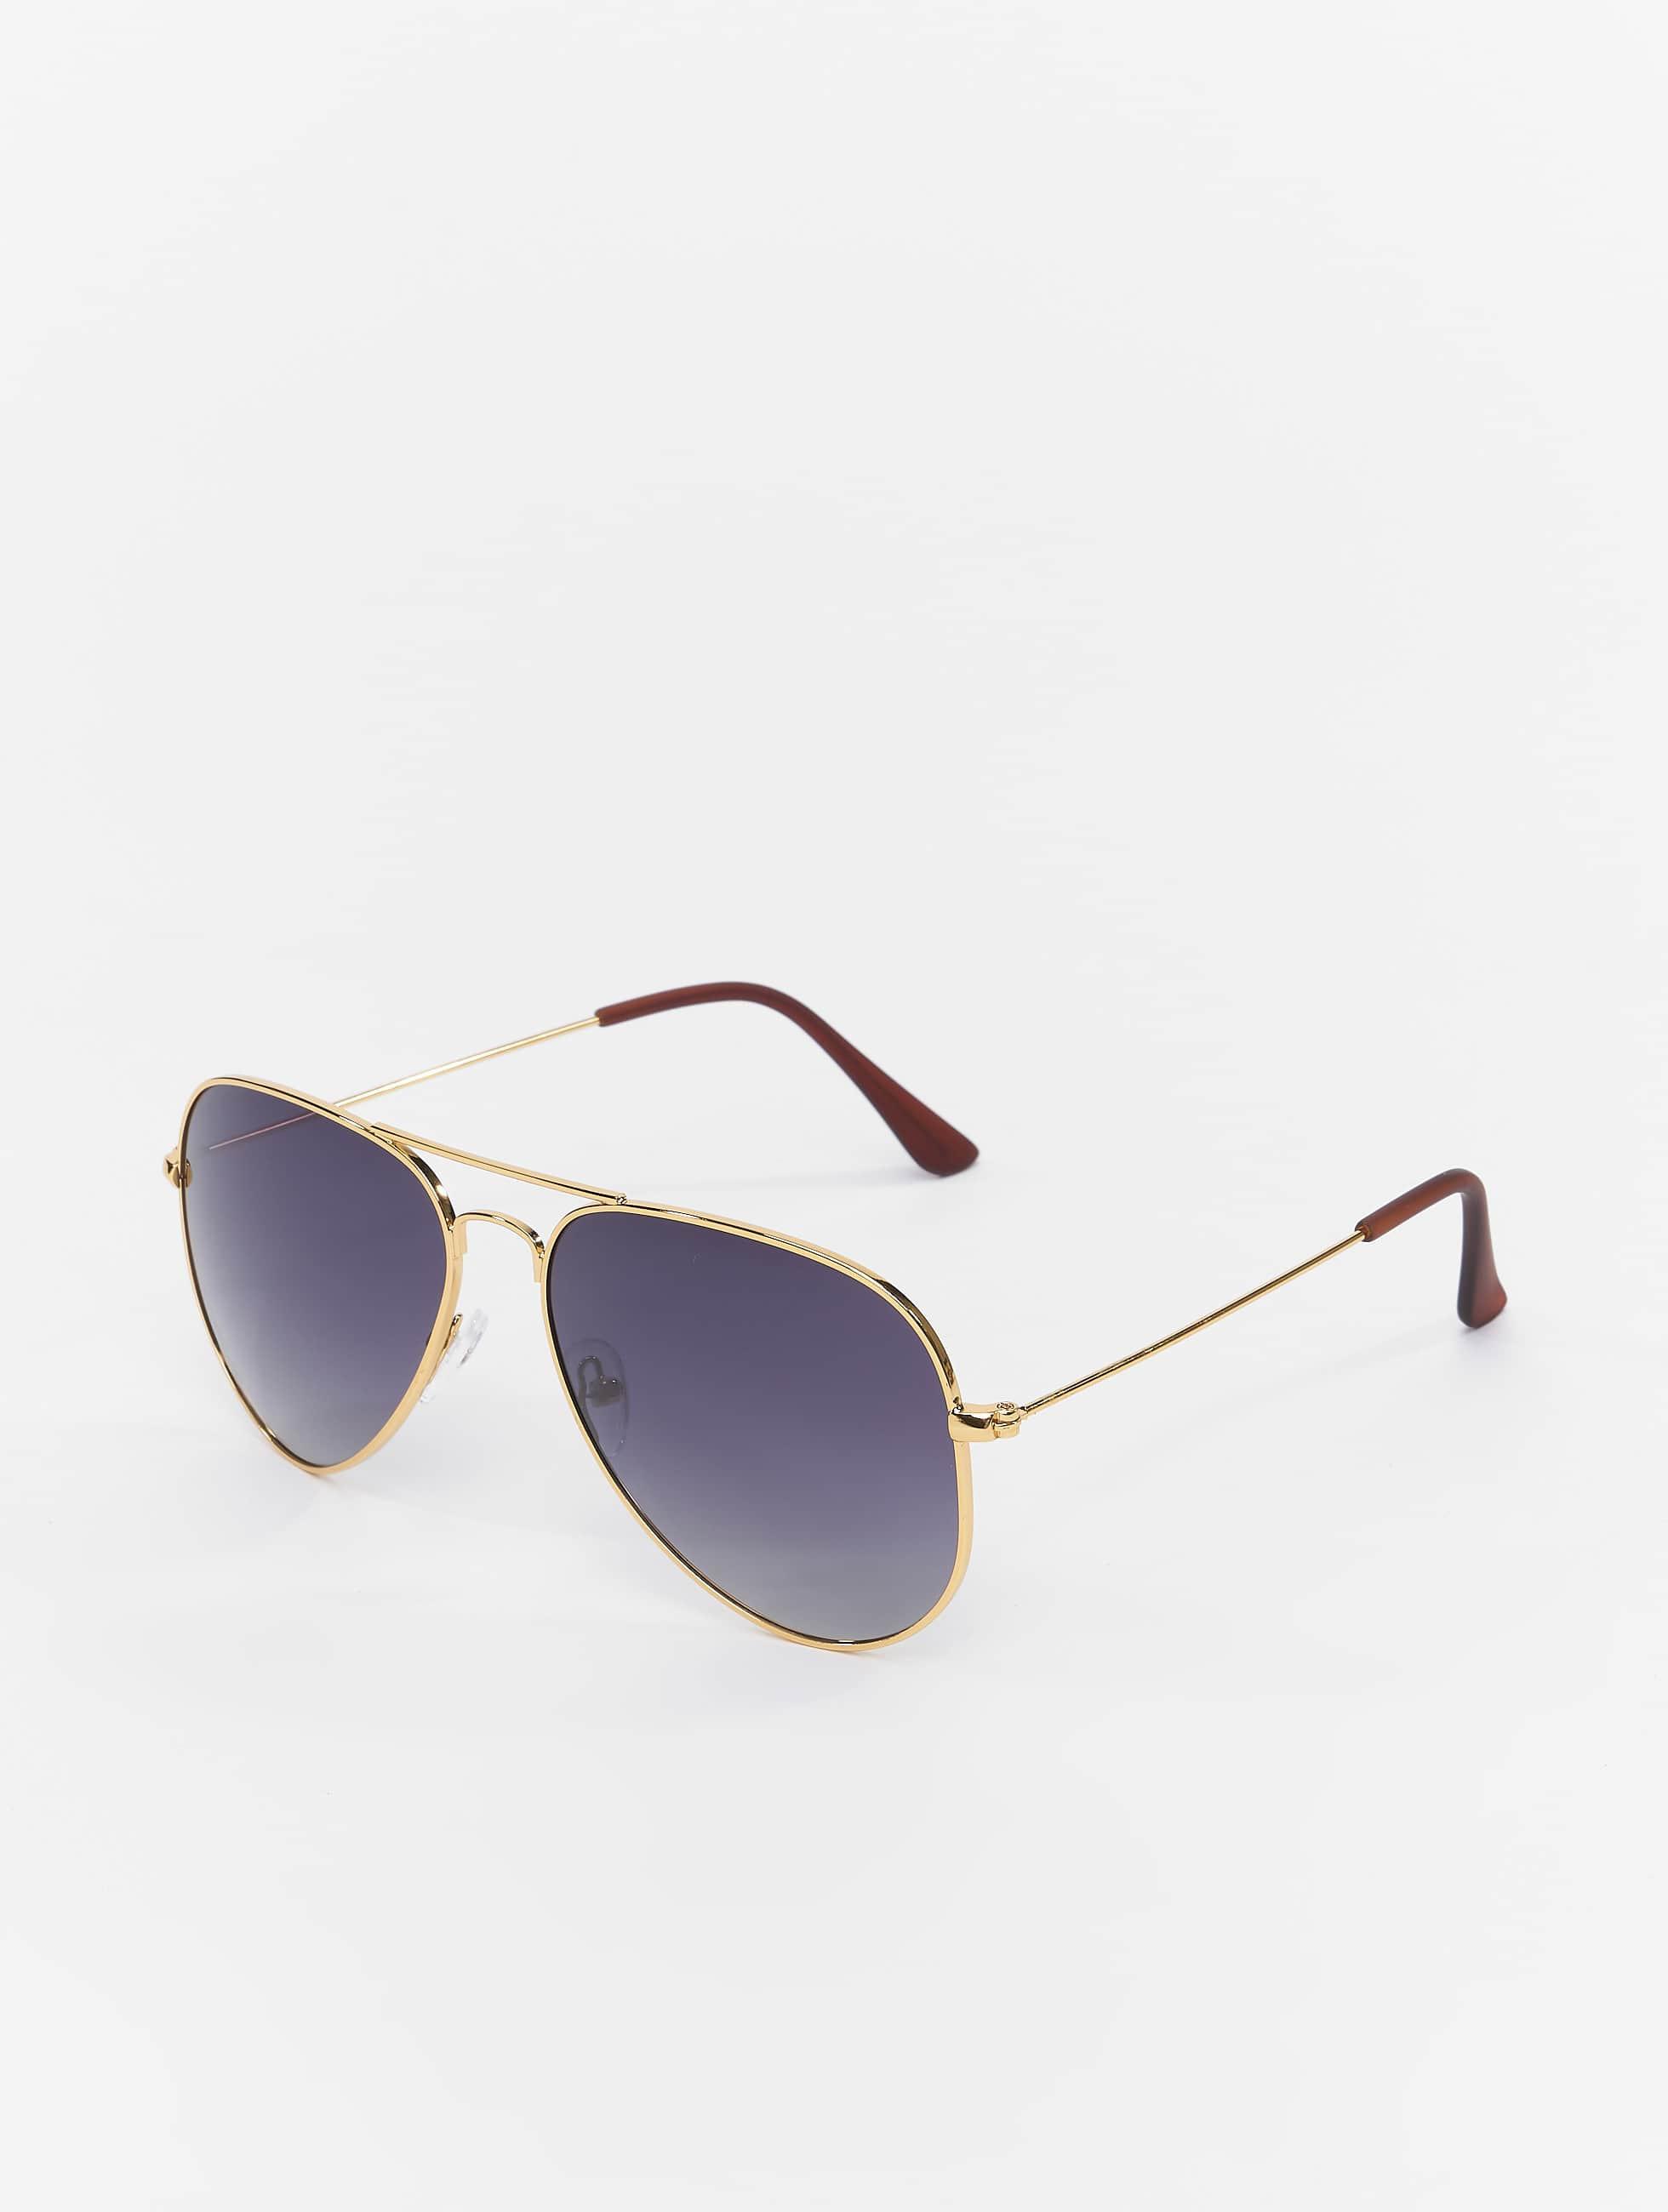 MSTRDS Sunglasses Pure AV Polarized Mirror gold